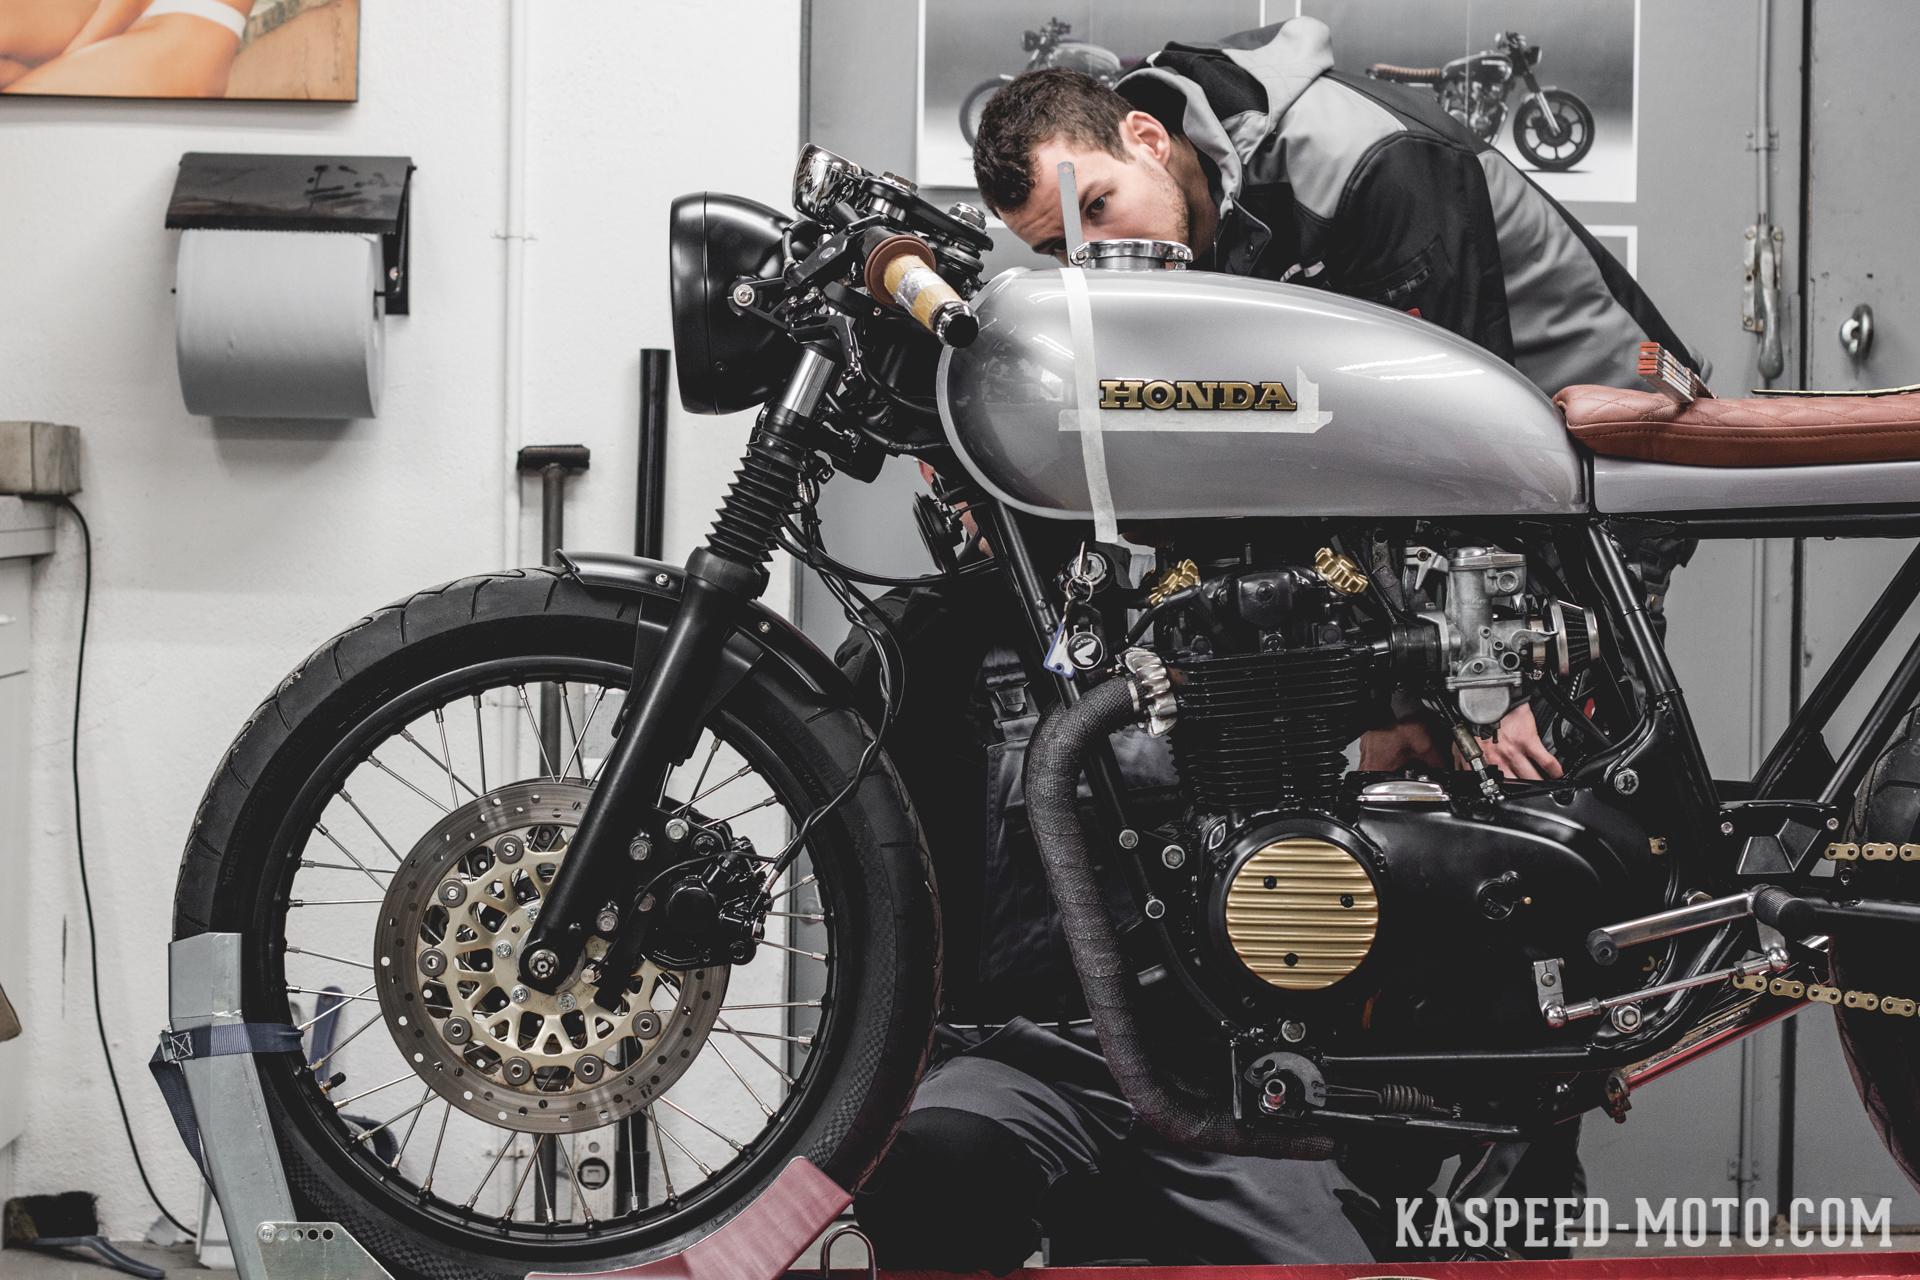 Deutsch Kaspeed Custom Motorcycles Cafe Racer Scrambler Brat